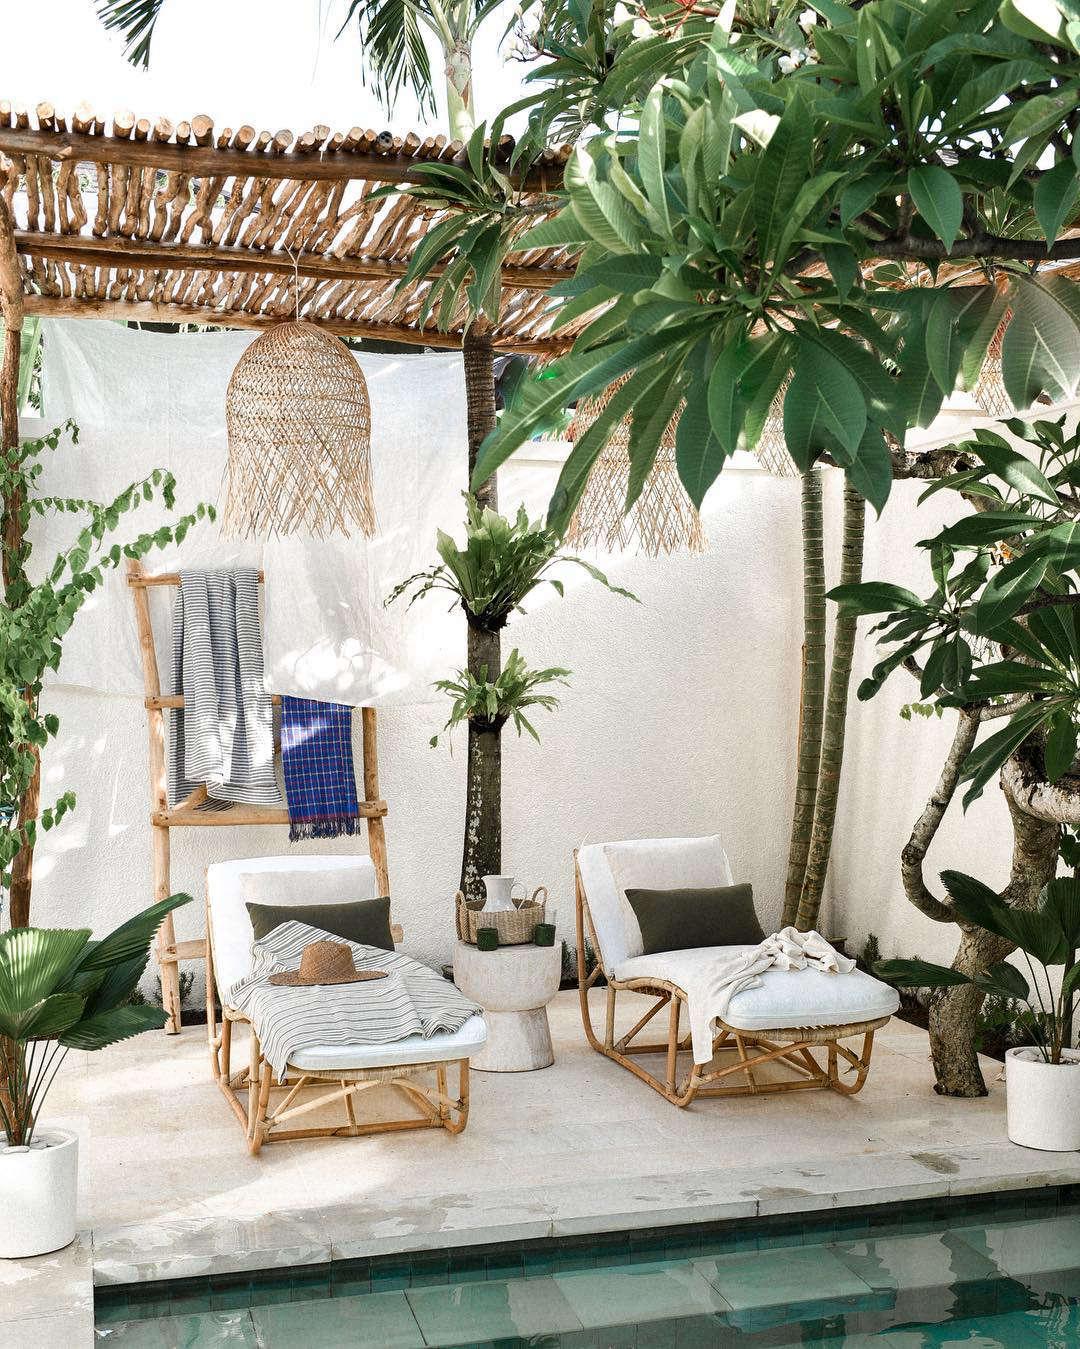 Pool and Lounge Chairs at Villa Arunja Airbnb in Canggu Bali